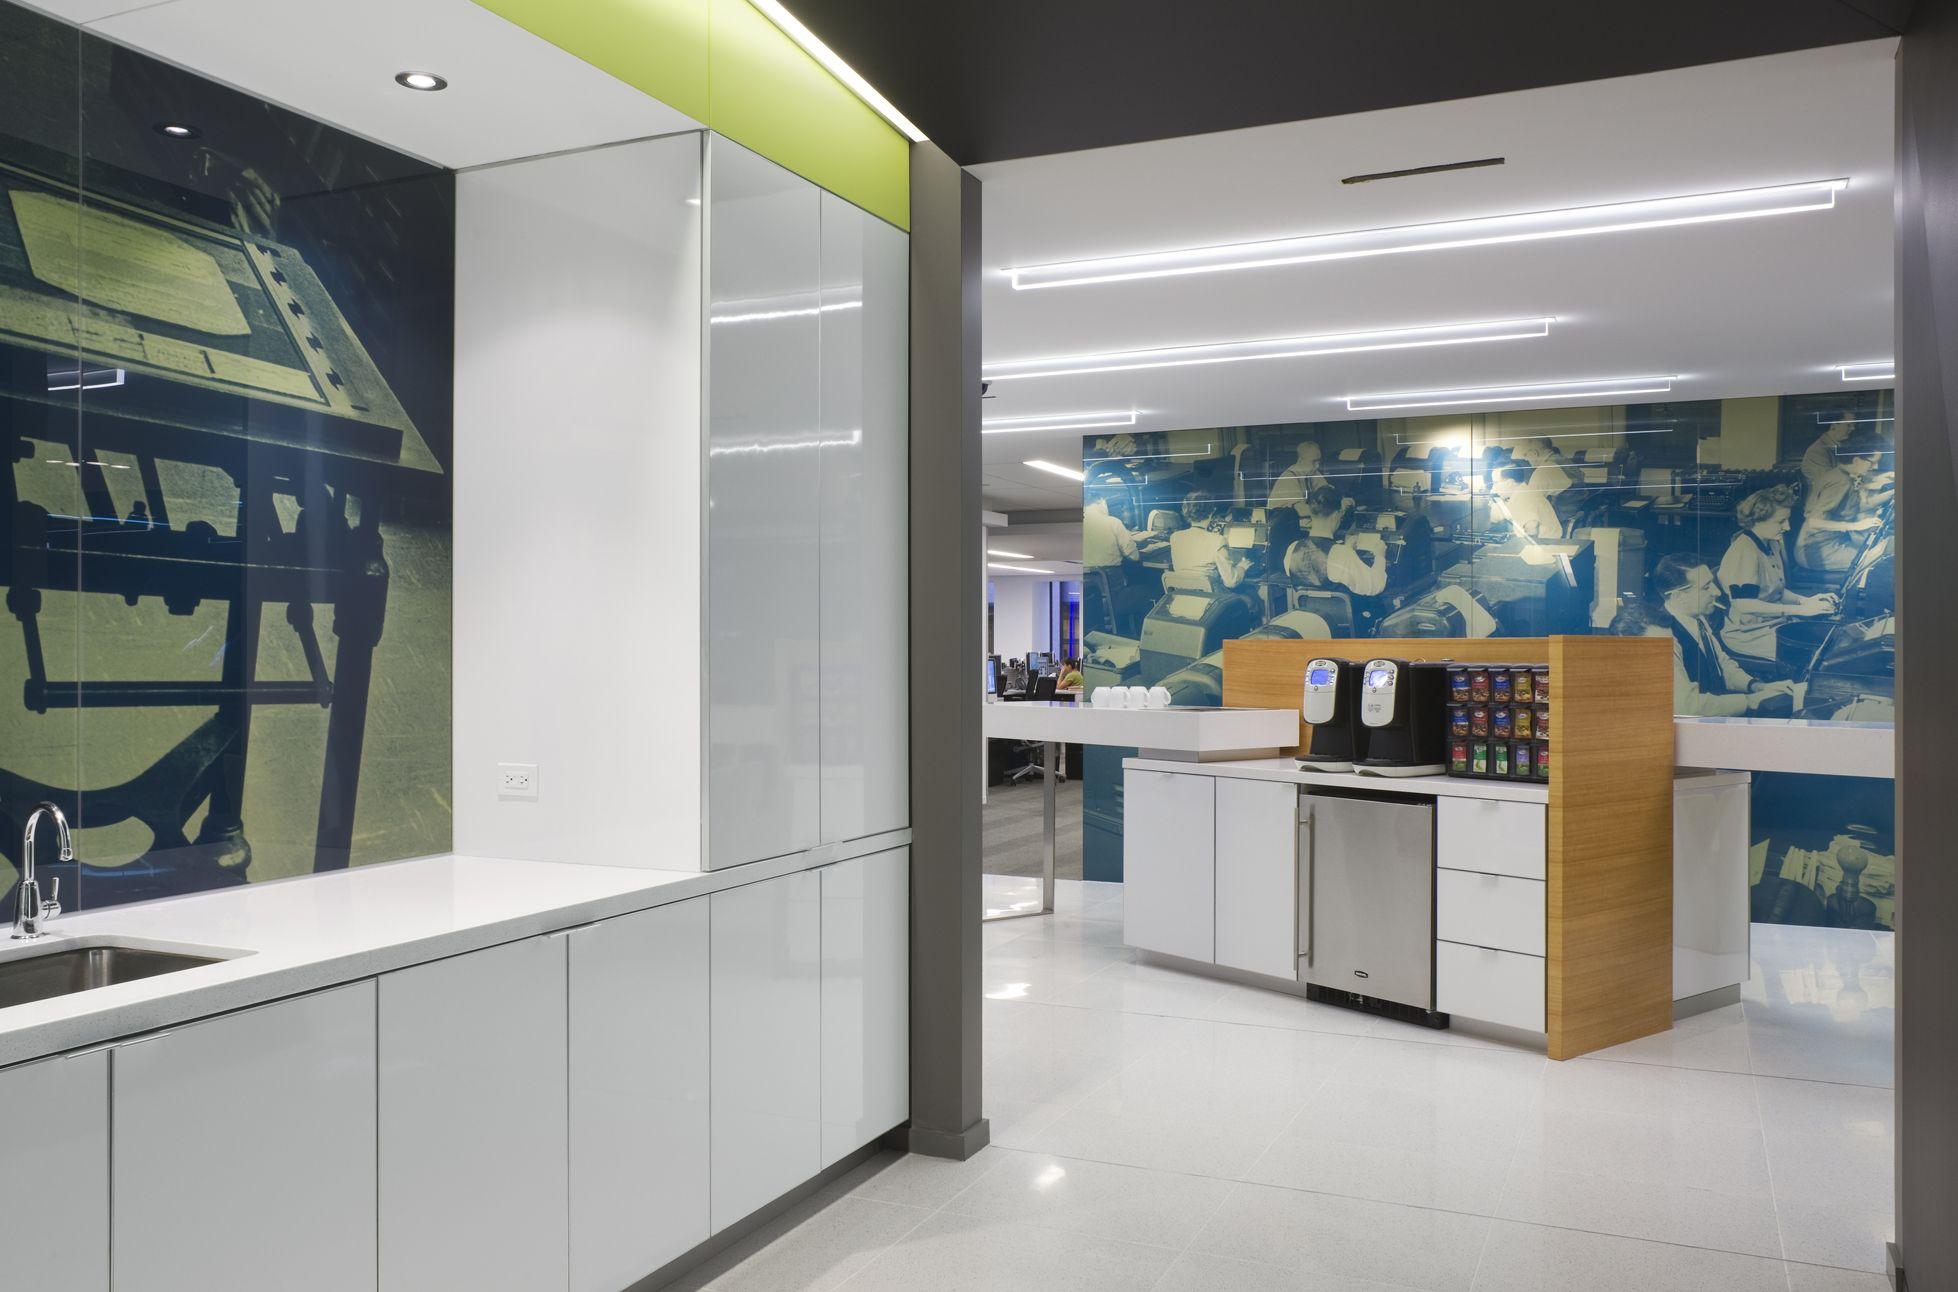 Fin lighting Light architecture Architecture Accent decor